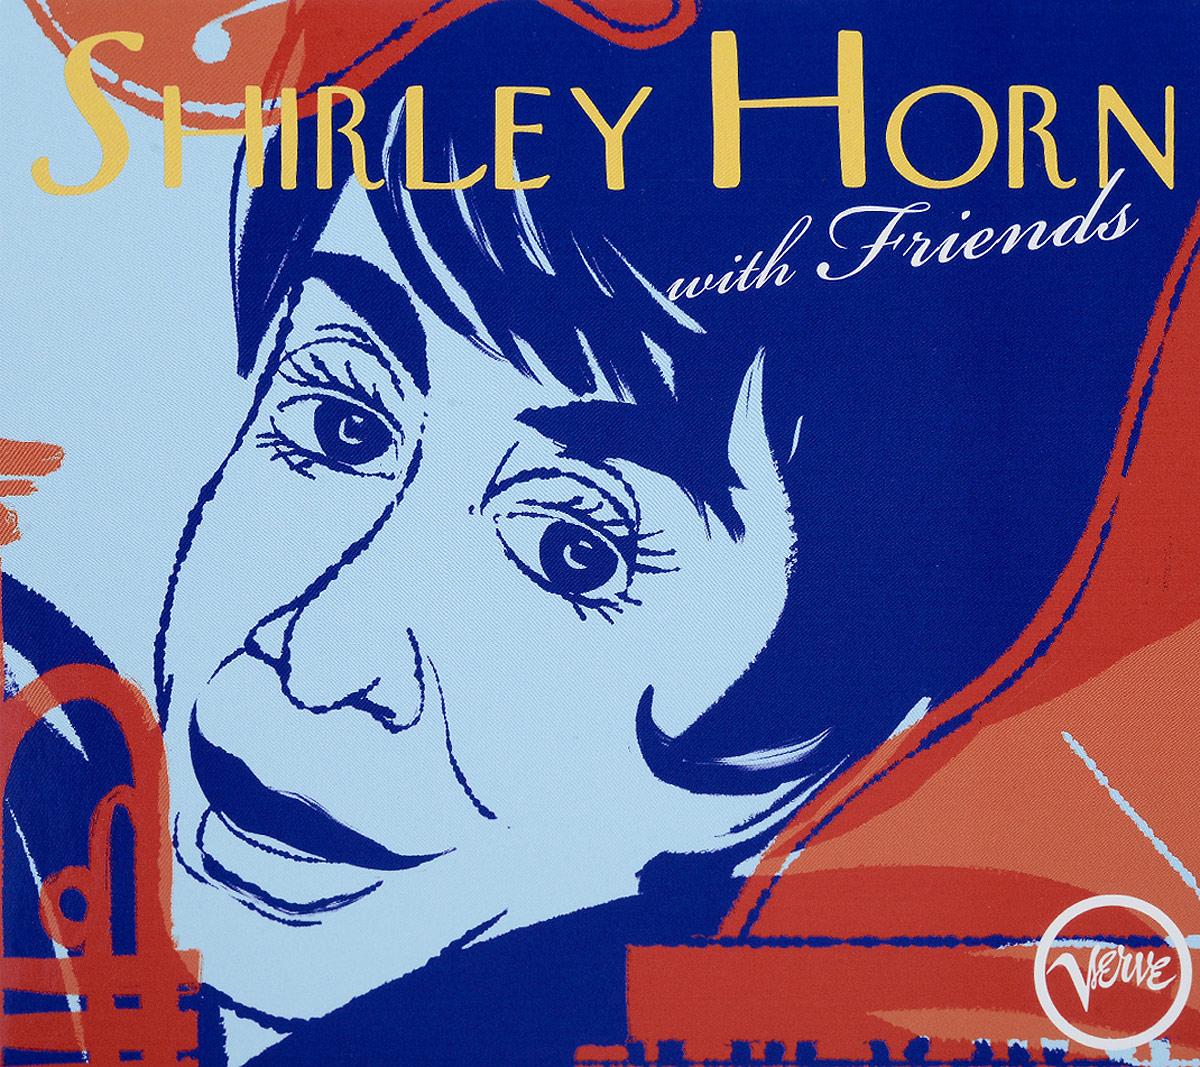 Ширли Хорн Shirley Horn. With Friends (2 CD) 200w car alarm siren 7 tone loudspeaker horn with round iron speaker police horn megaphone car styling buzzer